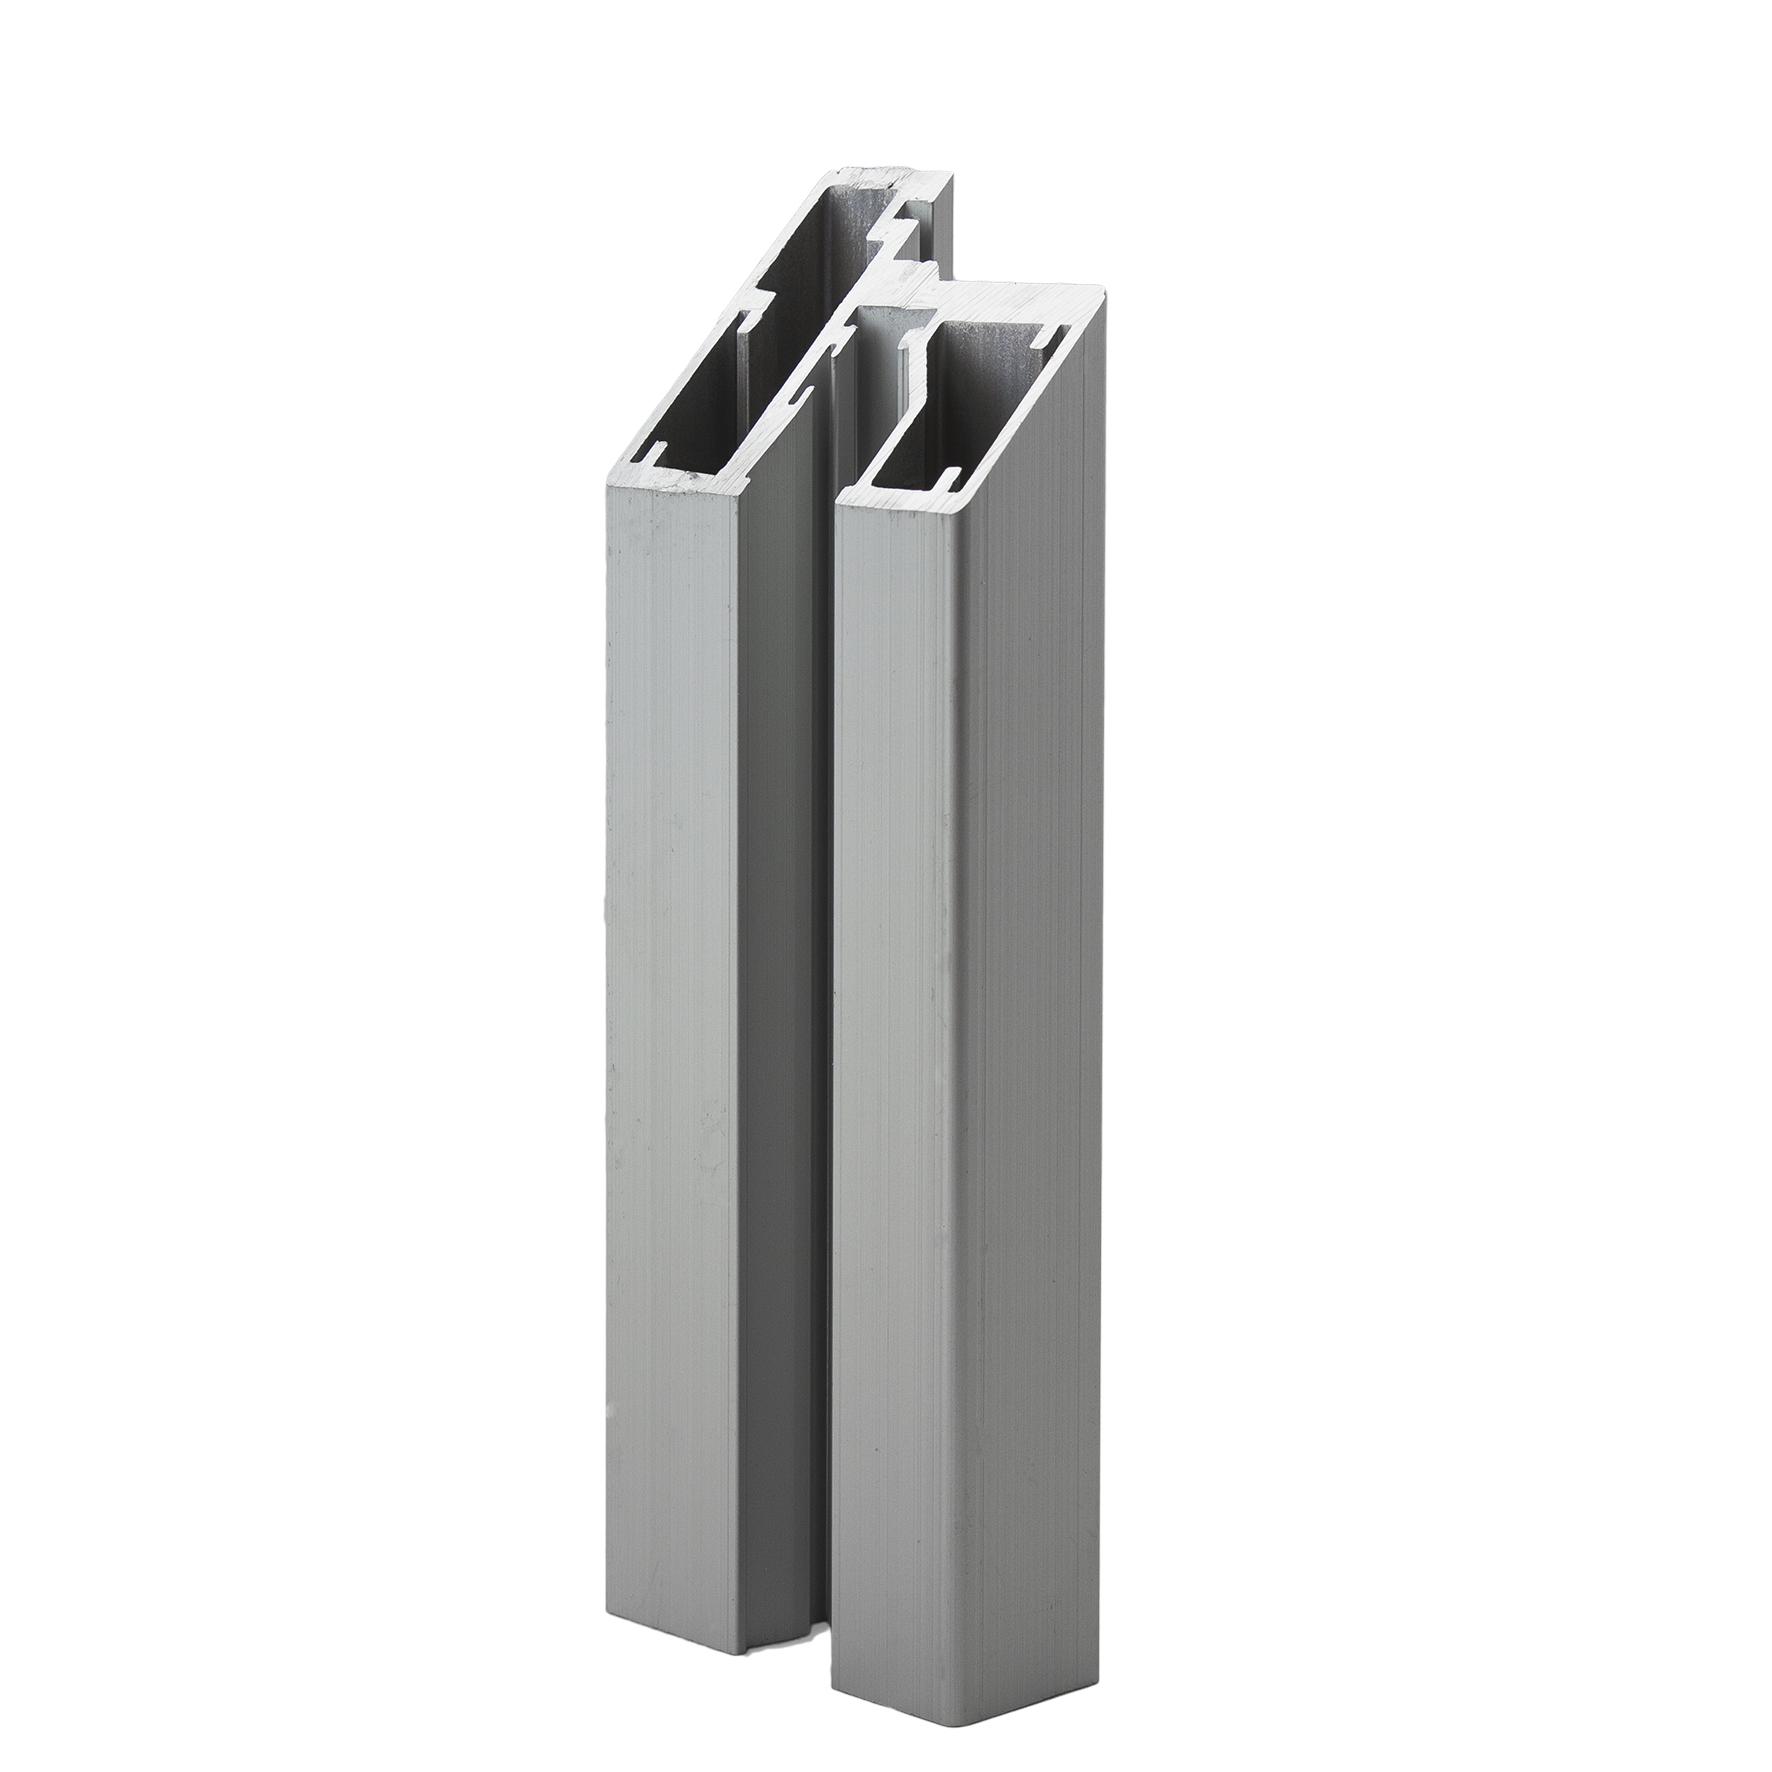 Dörrkarmsprofil i aluminium